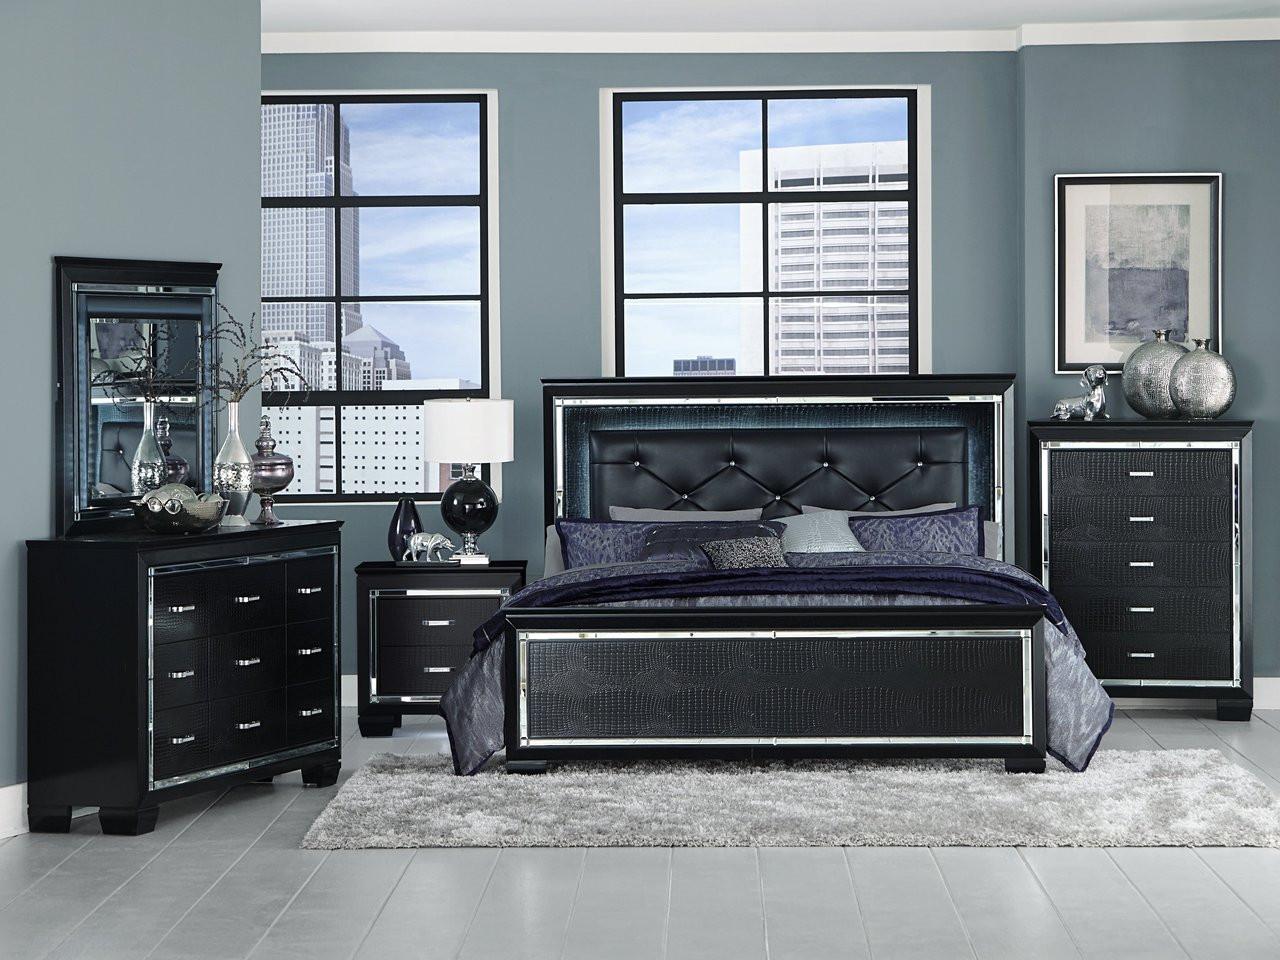 Homelegance Allura Collection 4 Piece Bedroom Set in Black